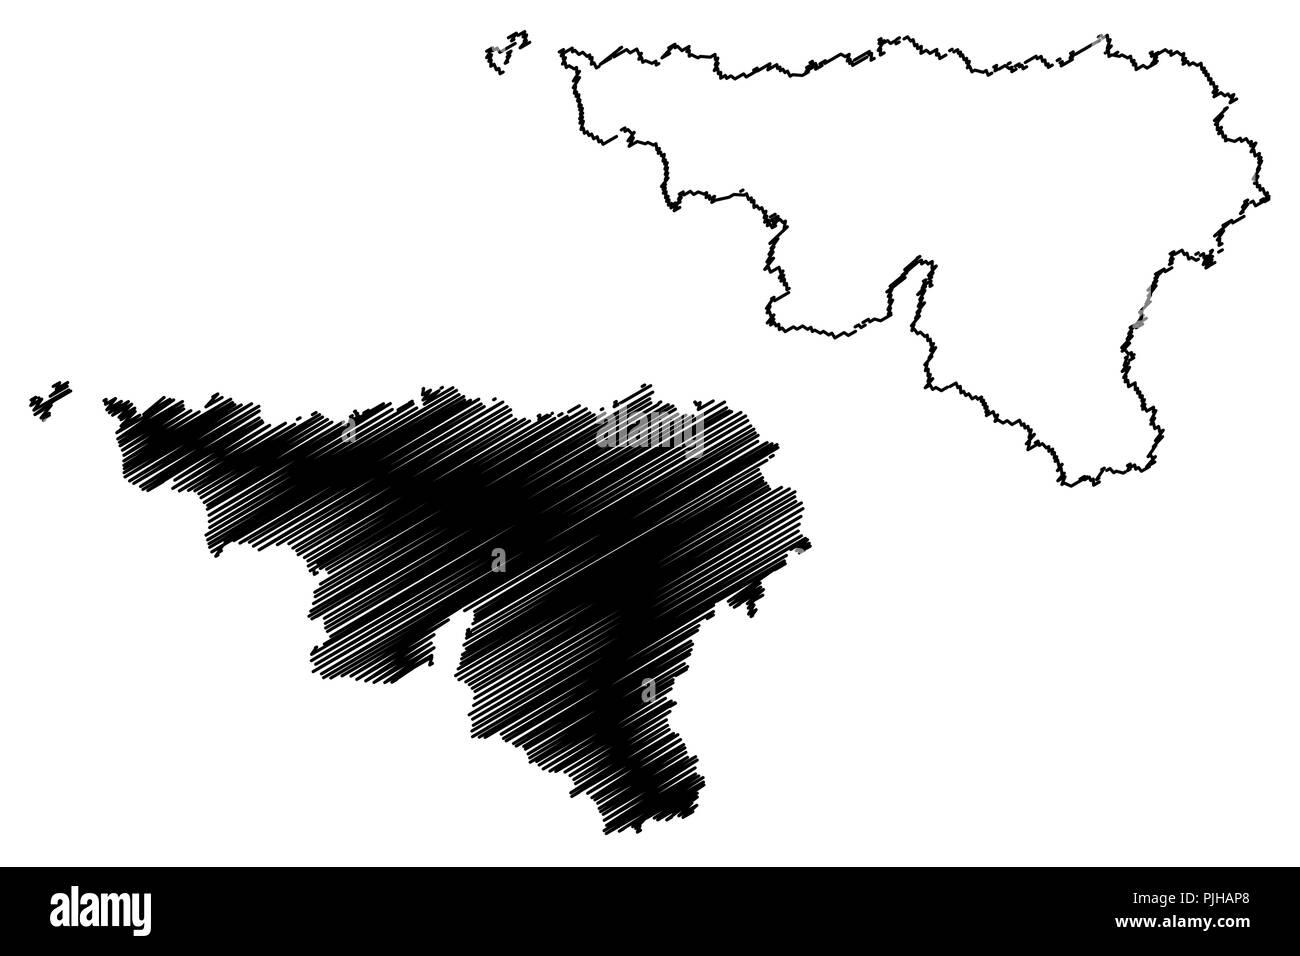 Carte Belgique Communautes Et Regions.Carte De La Wallonie Photos Carte De La Wallonie Images Alamy